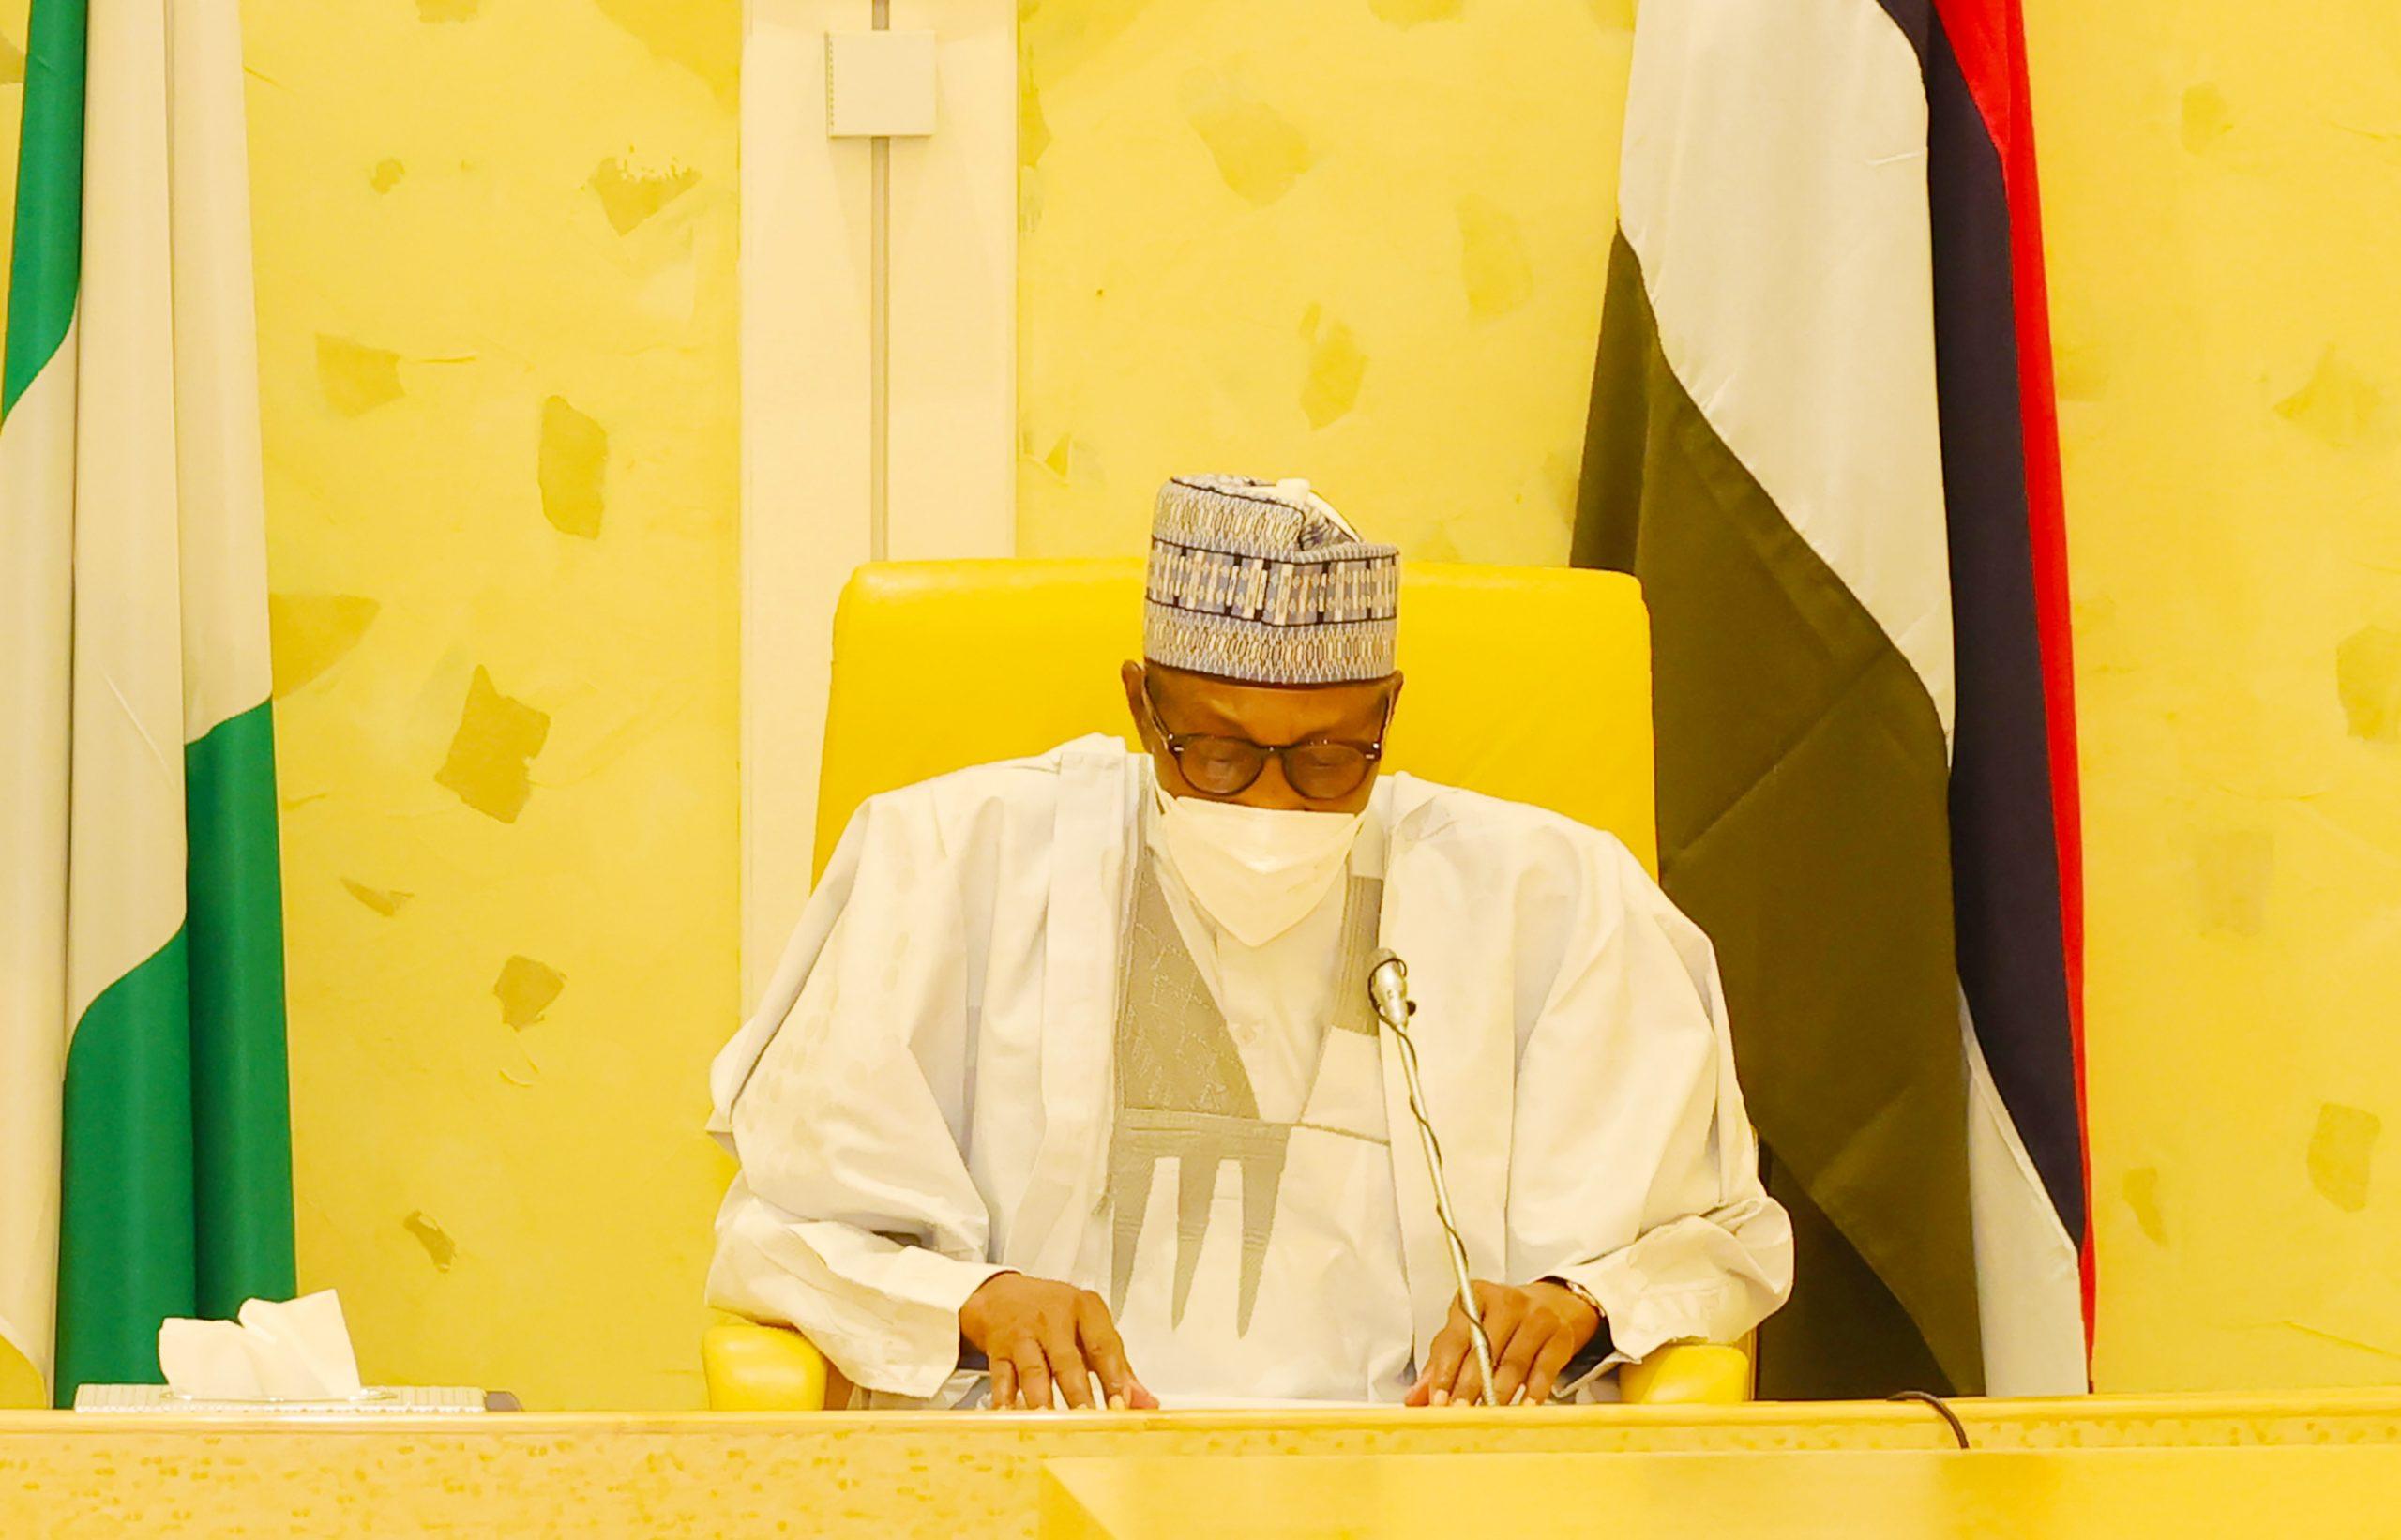 """We have empowered 1.6m Nigerian households""-President Buhari"